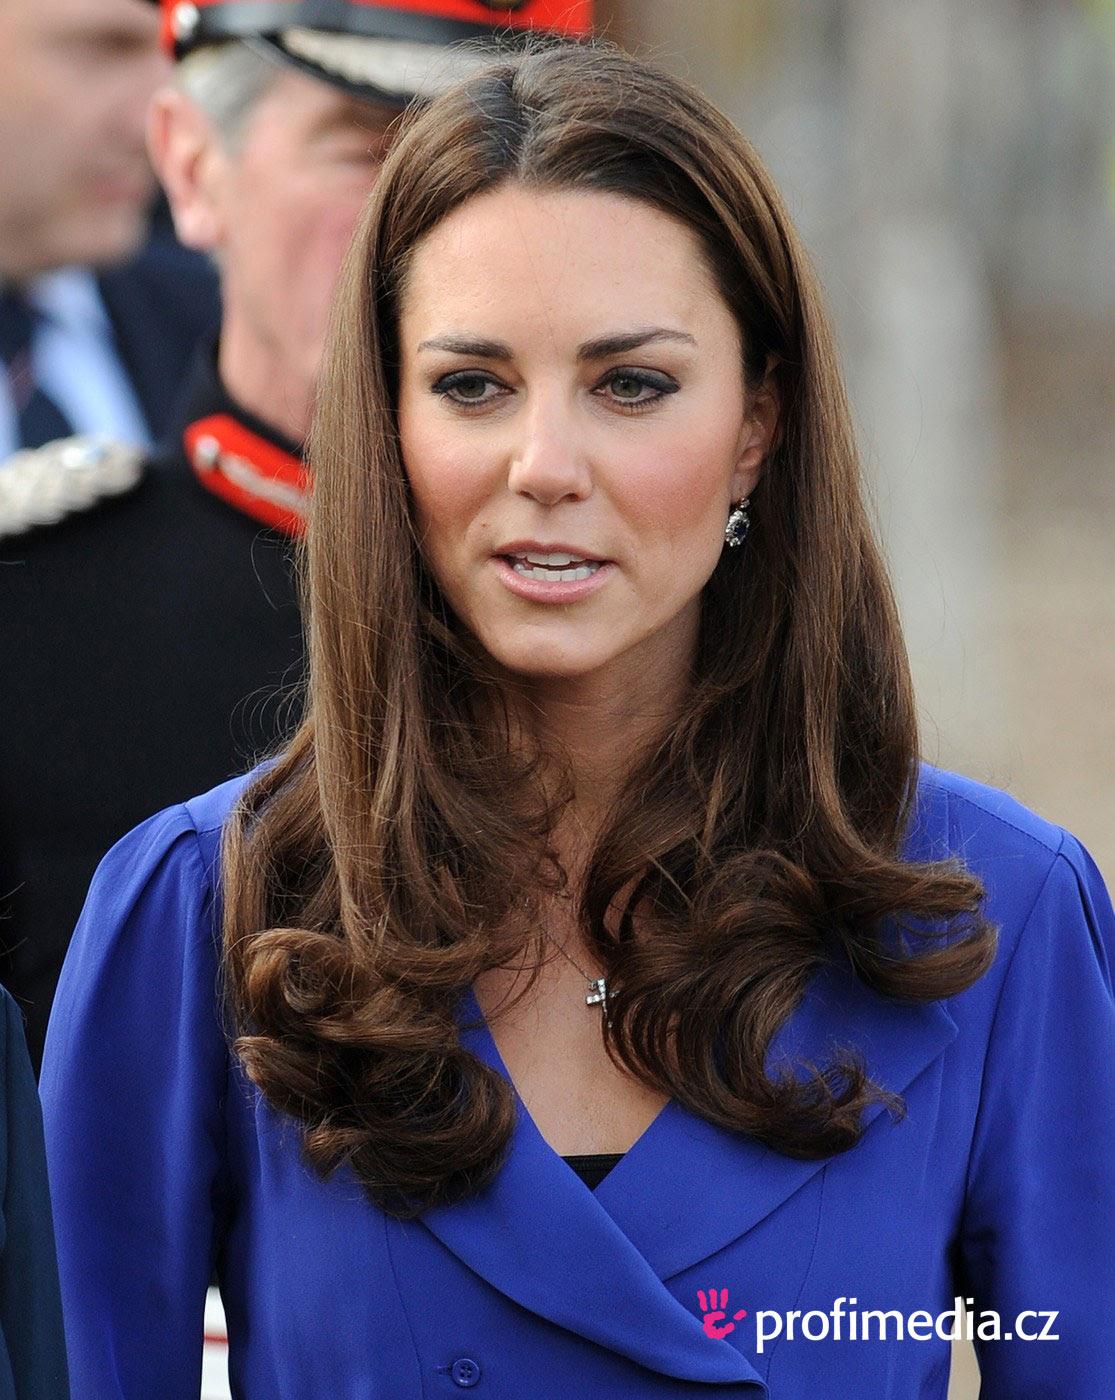 Frisur Wie Kate Middleton Frisuren Männer